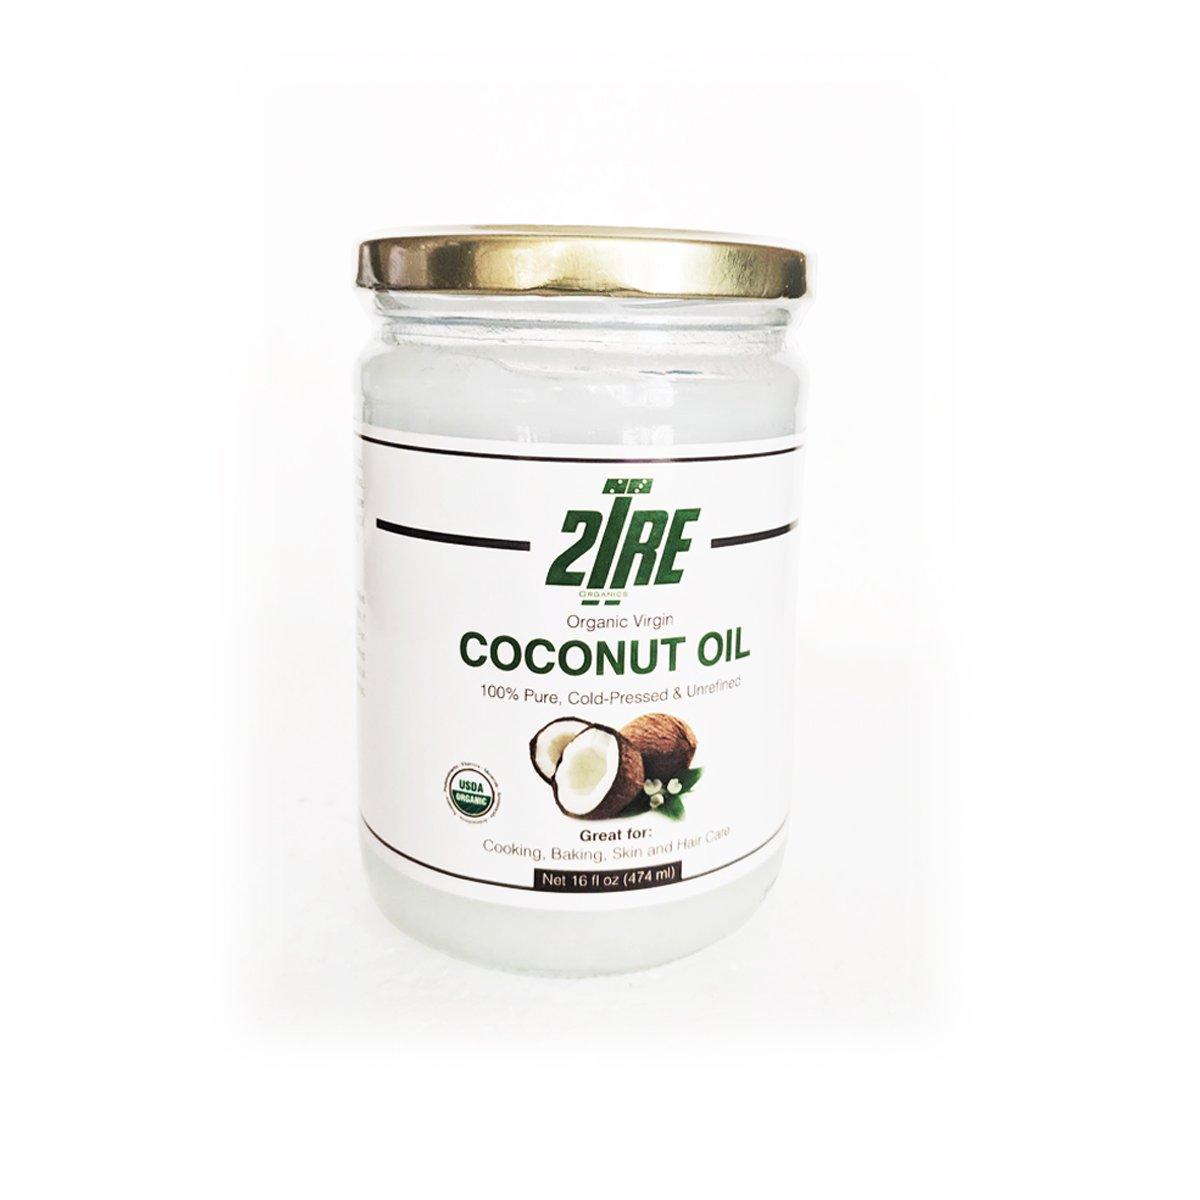 2Tre Organic Extra Virgin Coconut Oil - C Max 52% OFF Cold Pressed Discount mail order Unrefined